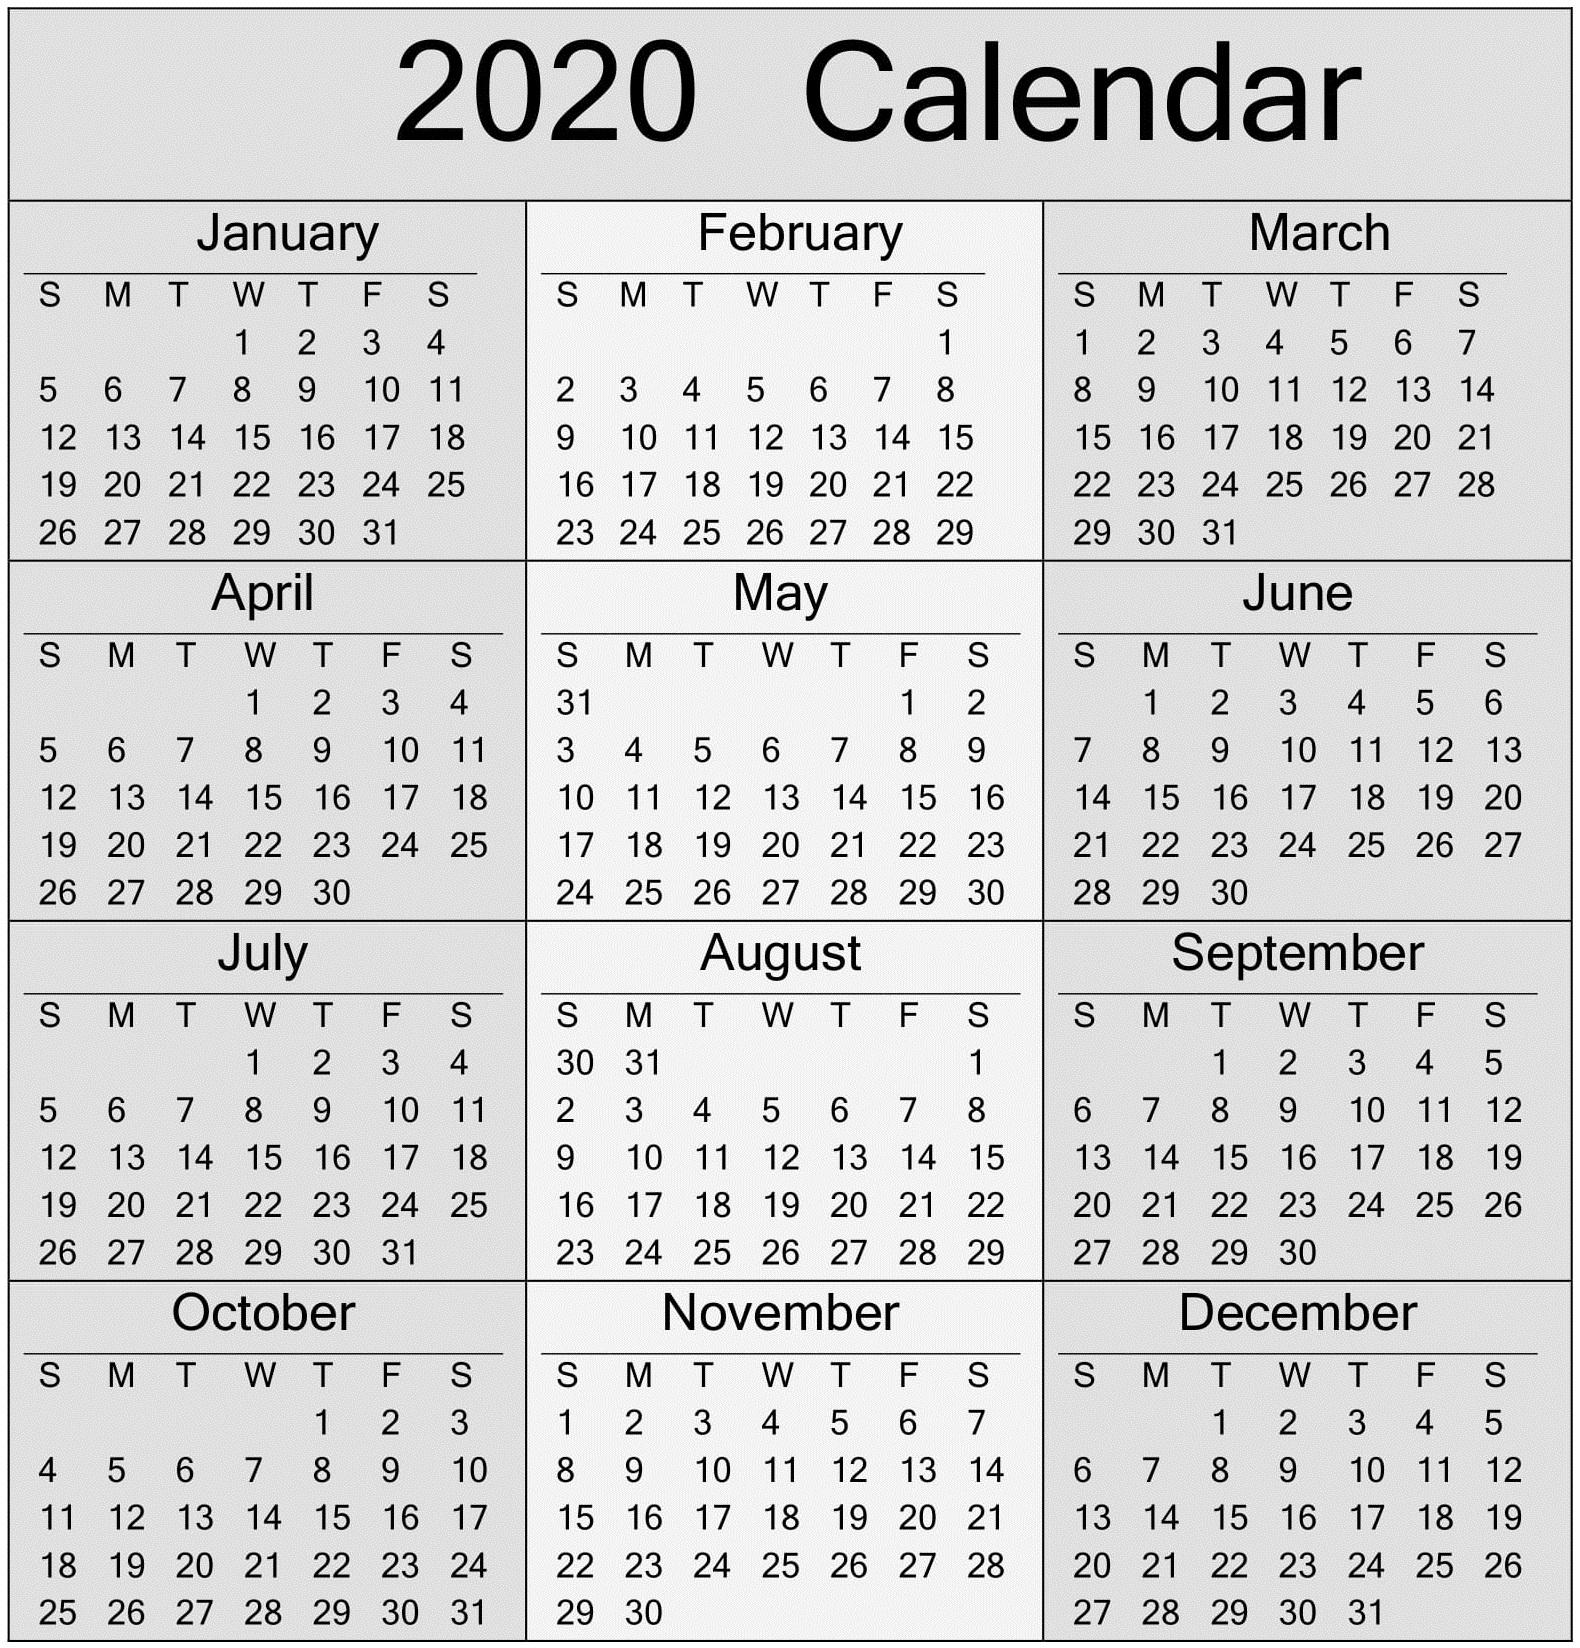 Sunday To Saturday Calendar 2020 Printable   Calendar pertaining to Calendar Sunday To Saturday